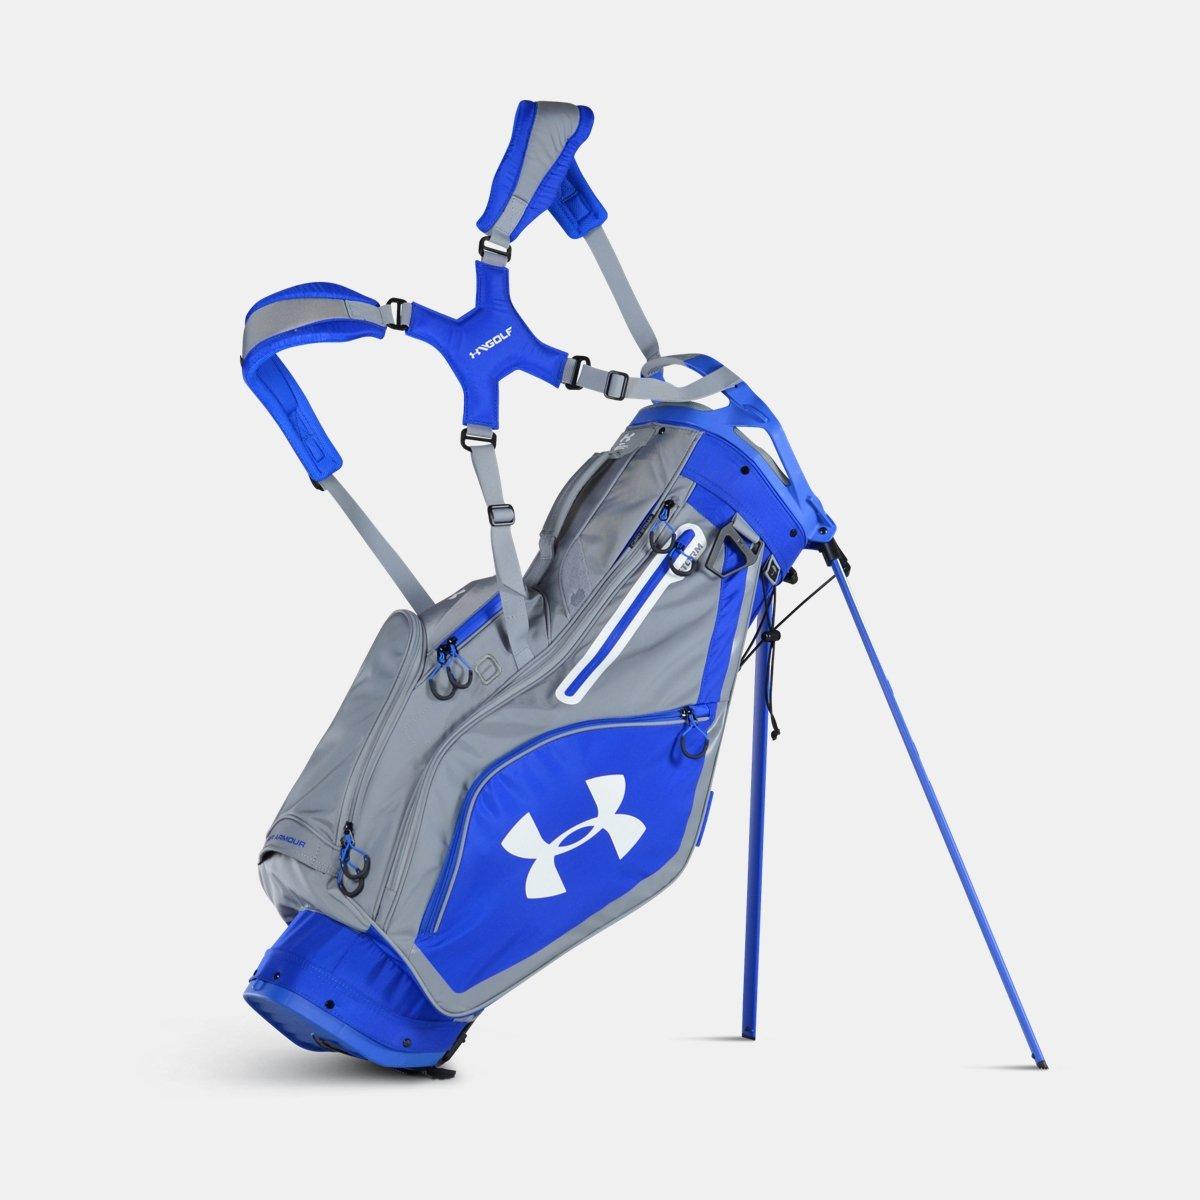 [UNDER ARMOUR] アンダーアーマー Men's UA Storm Match Play Stand Bag BLUE MARKER [並行輸入品] B074Z2HX8Z